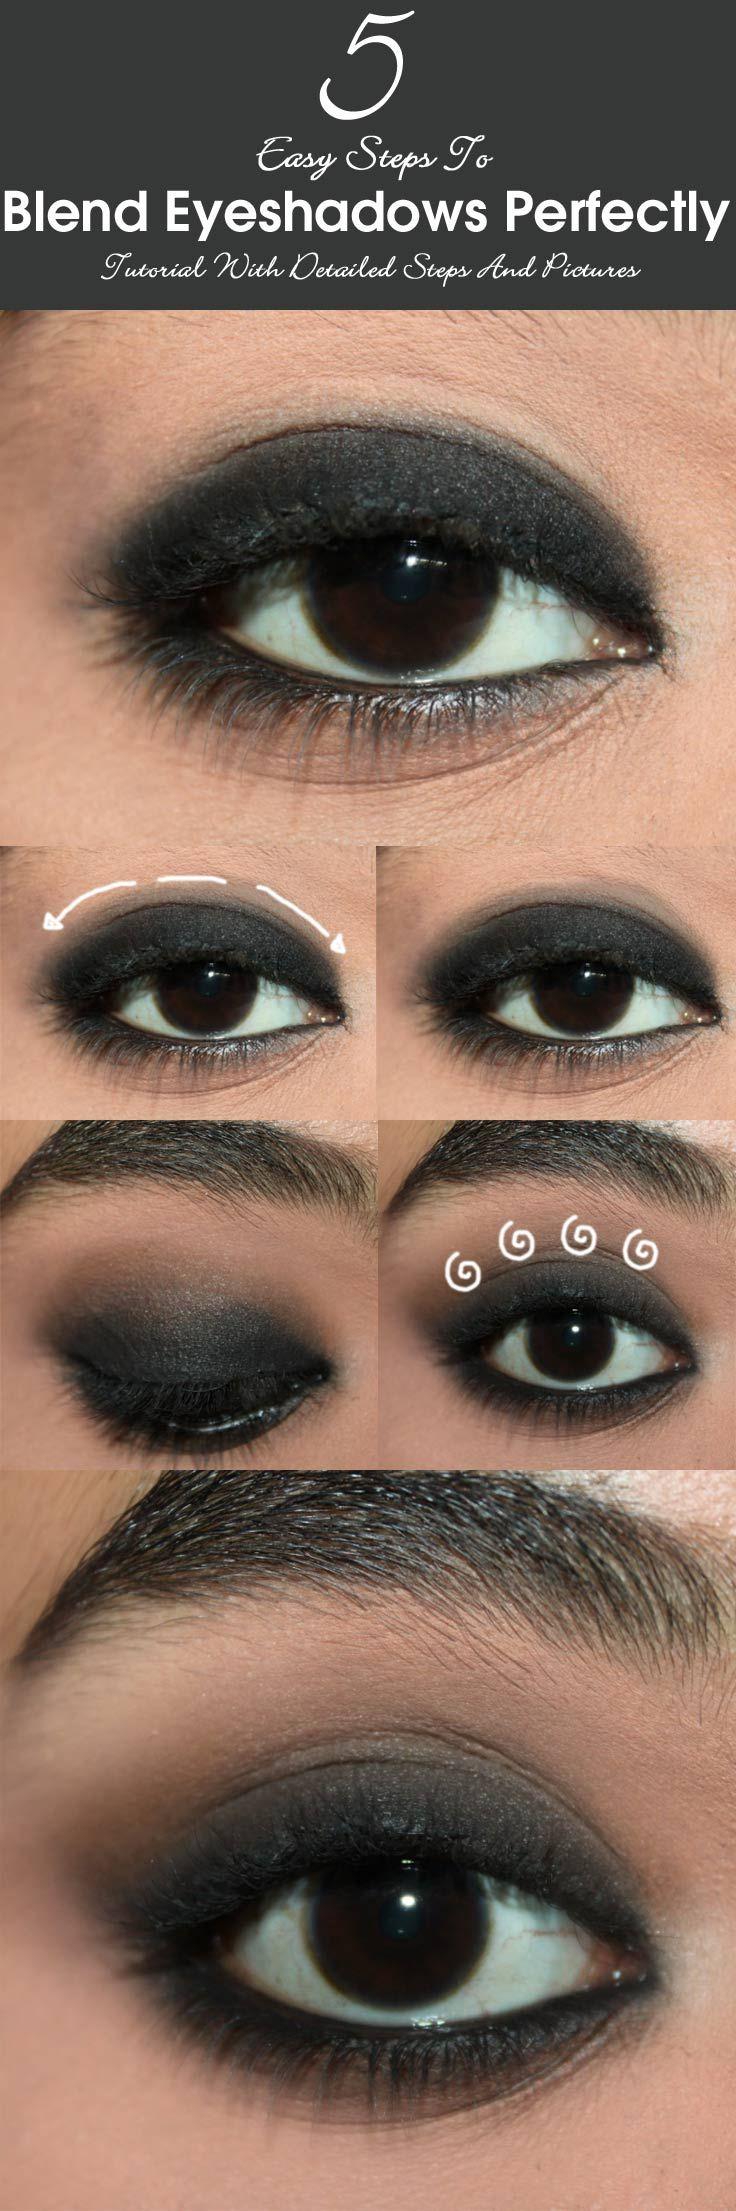 25+ best ideas about Blending eyeshadow on Pinterest | Simple ...